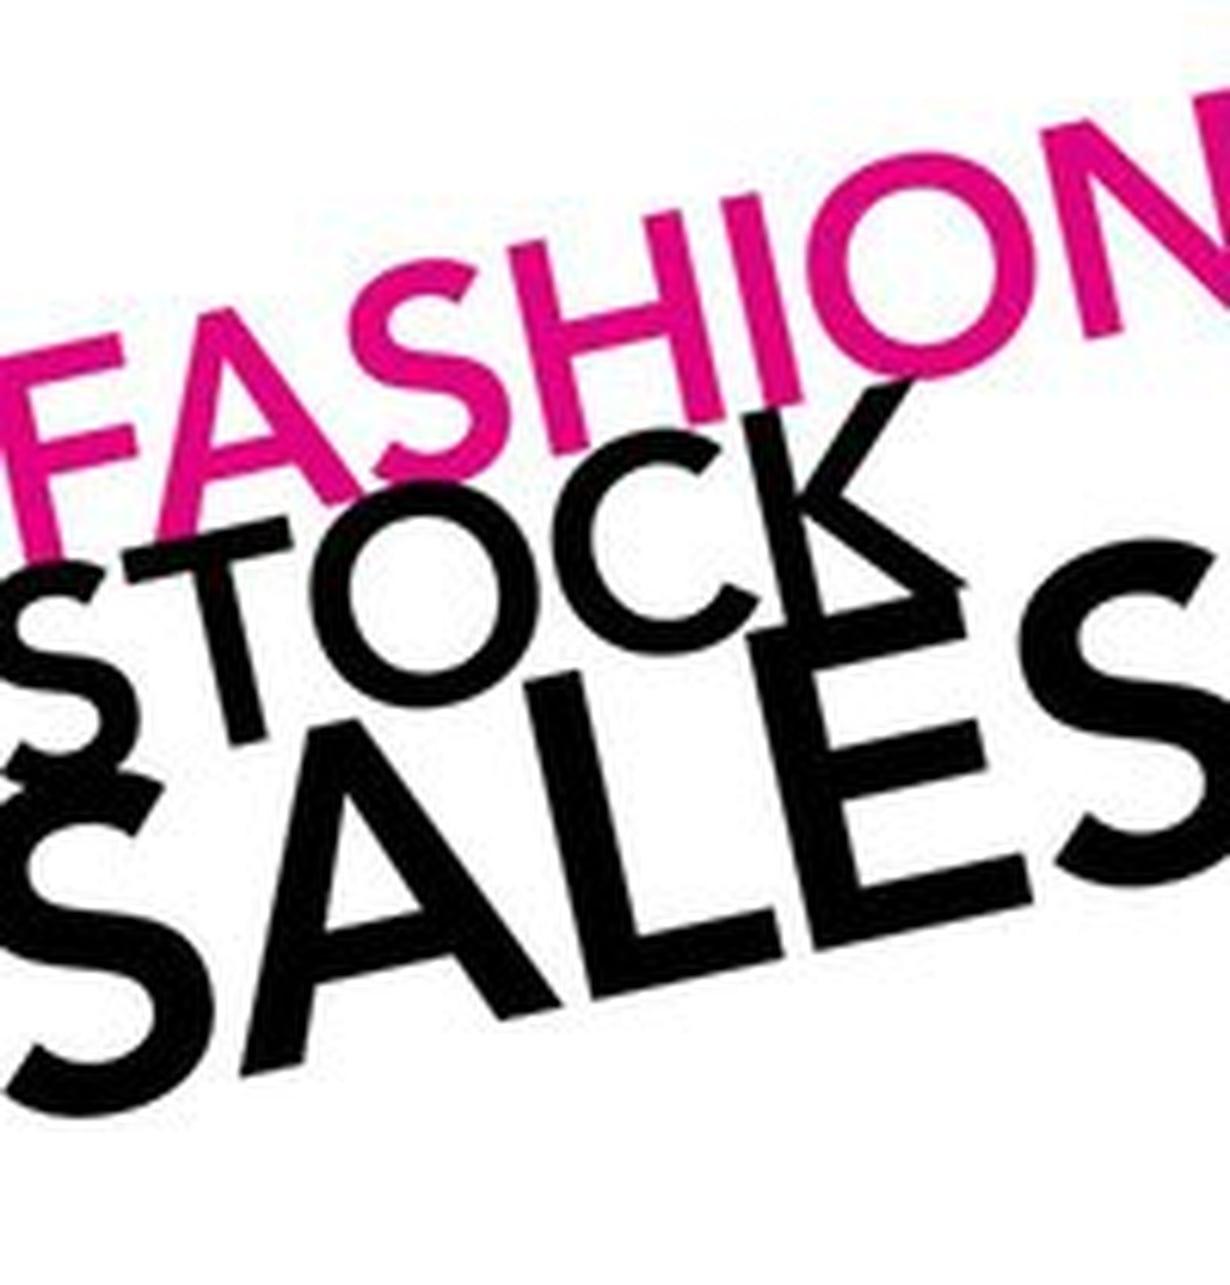 Fashion stock sales